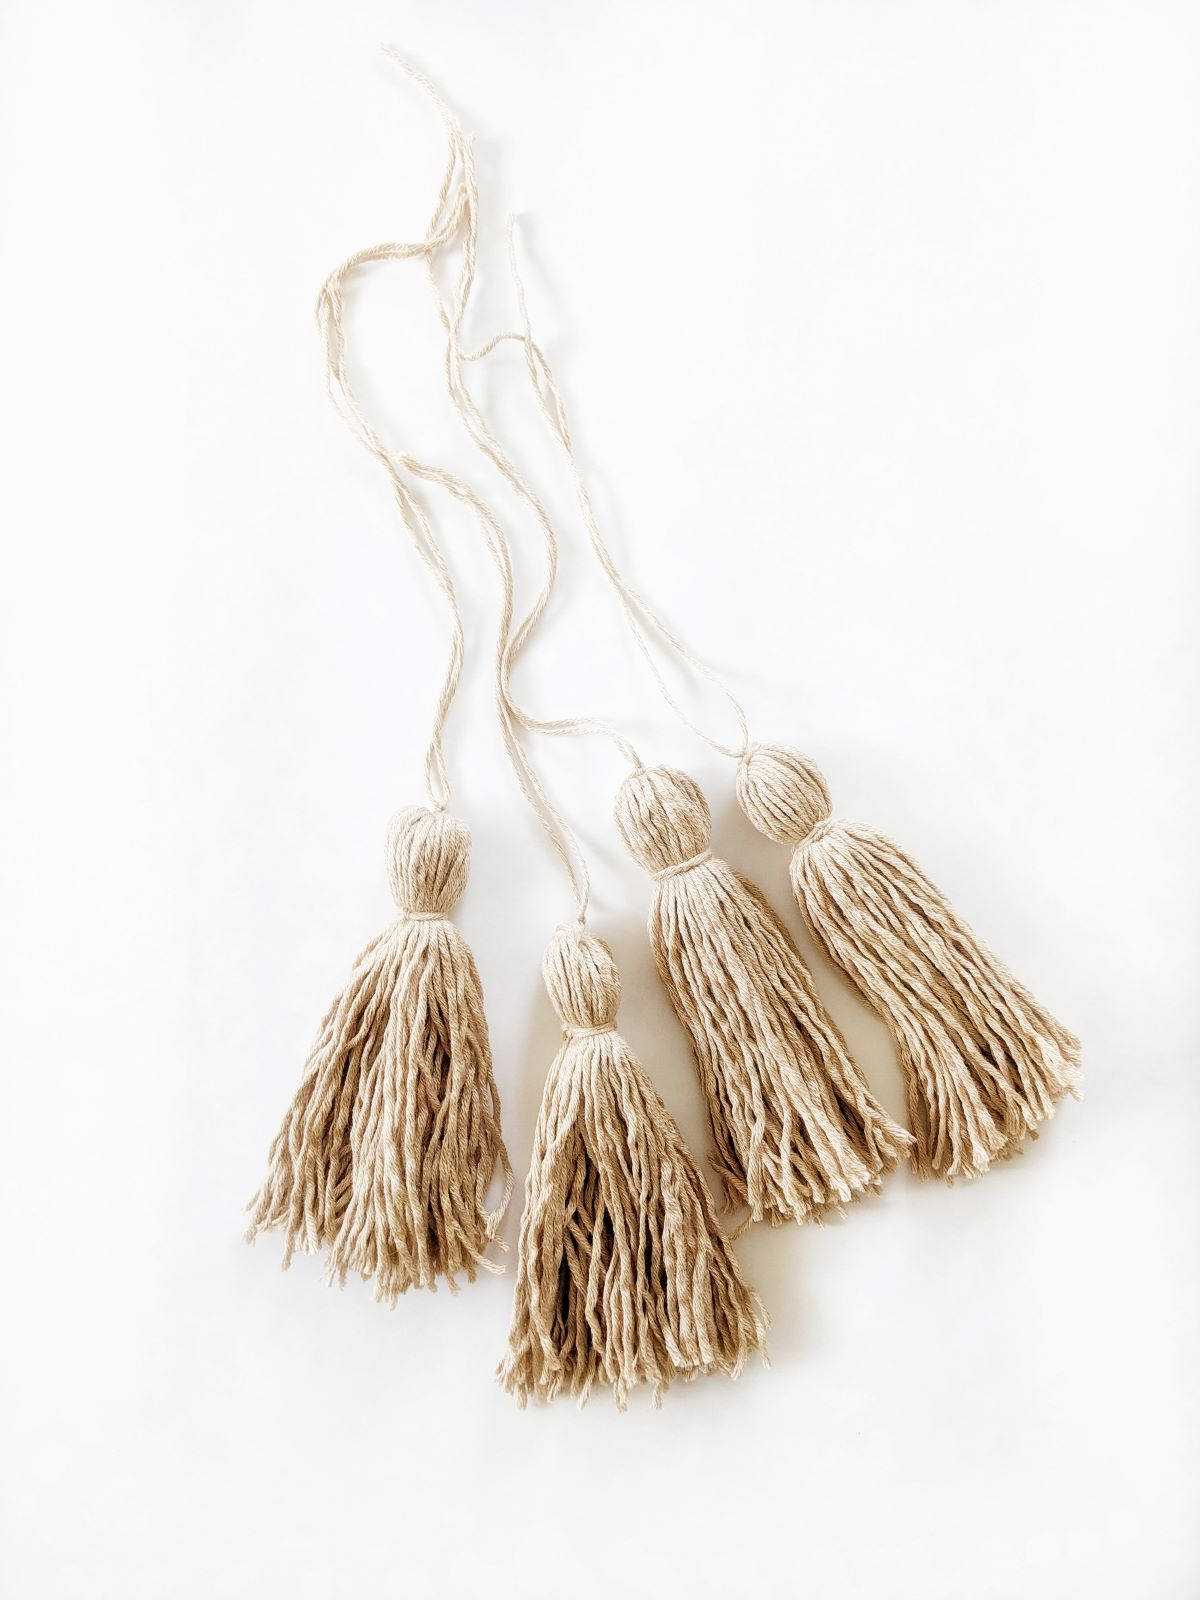 4 handmade tassels on a white surface using Lion Brand Coboo yarn